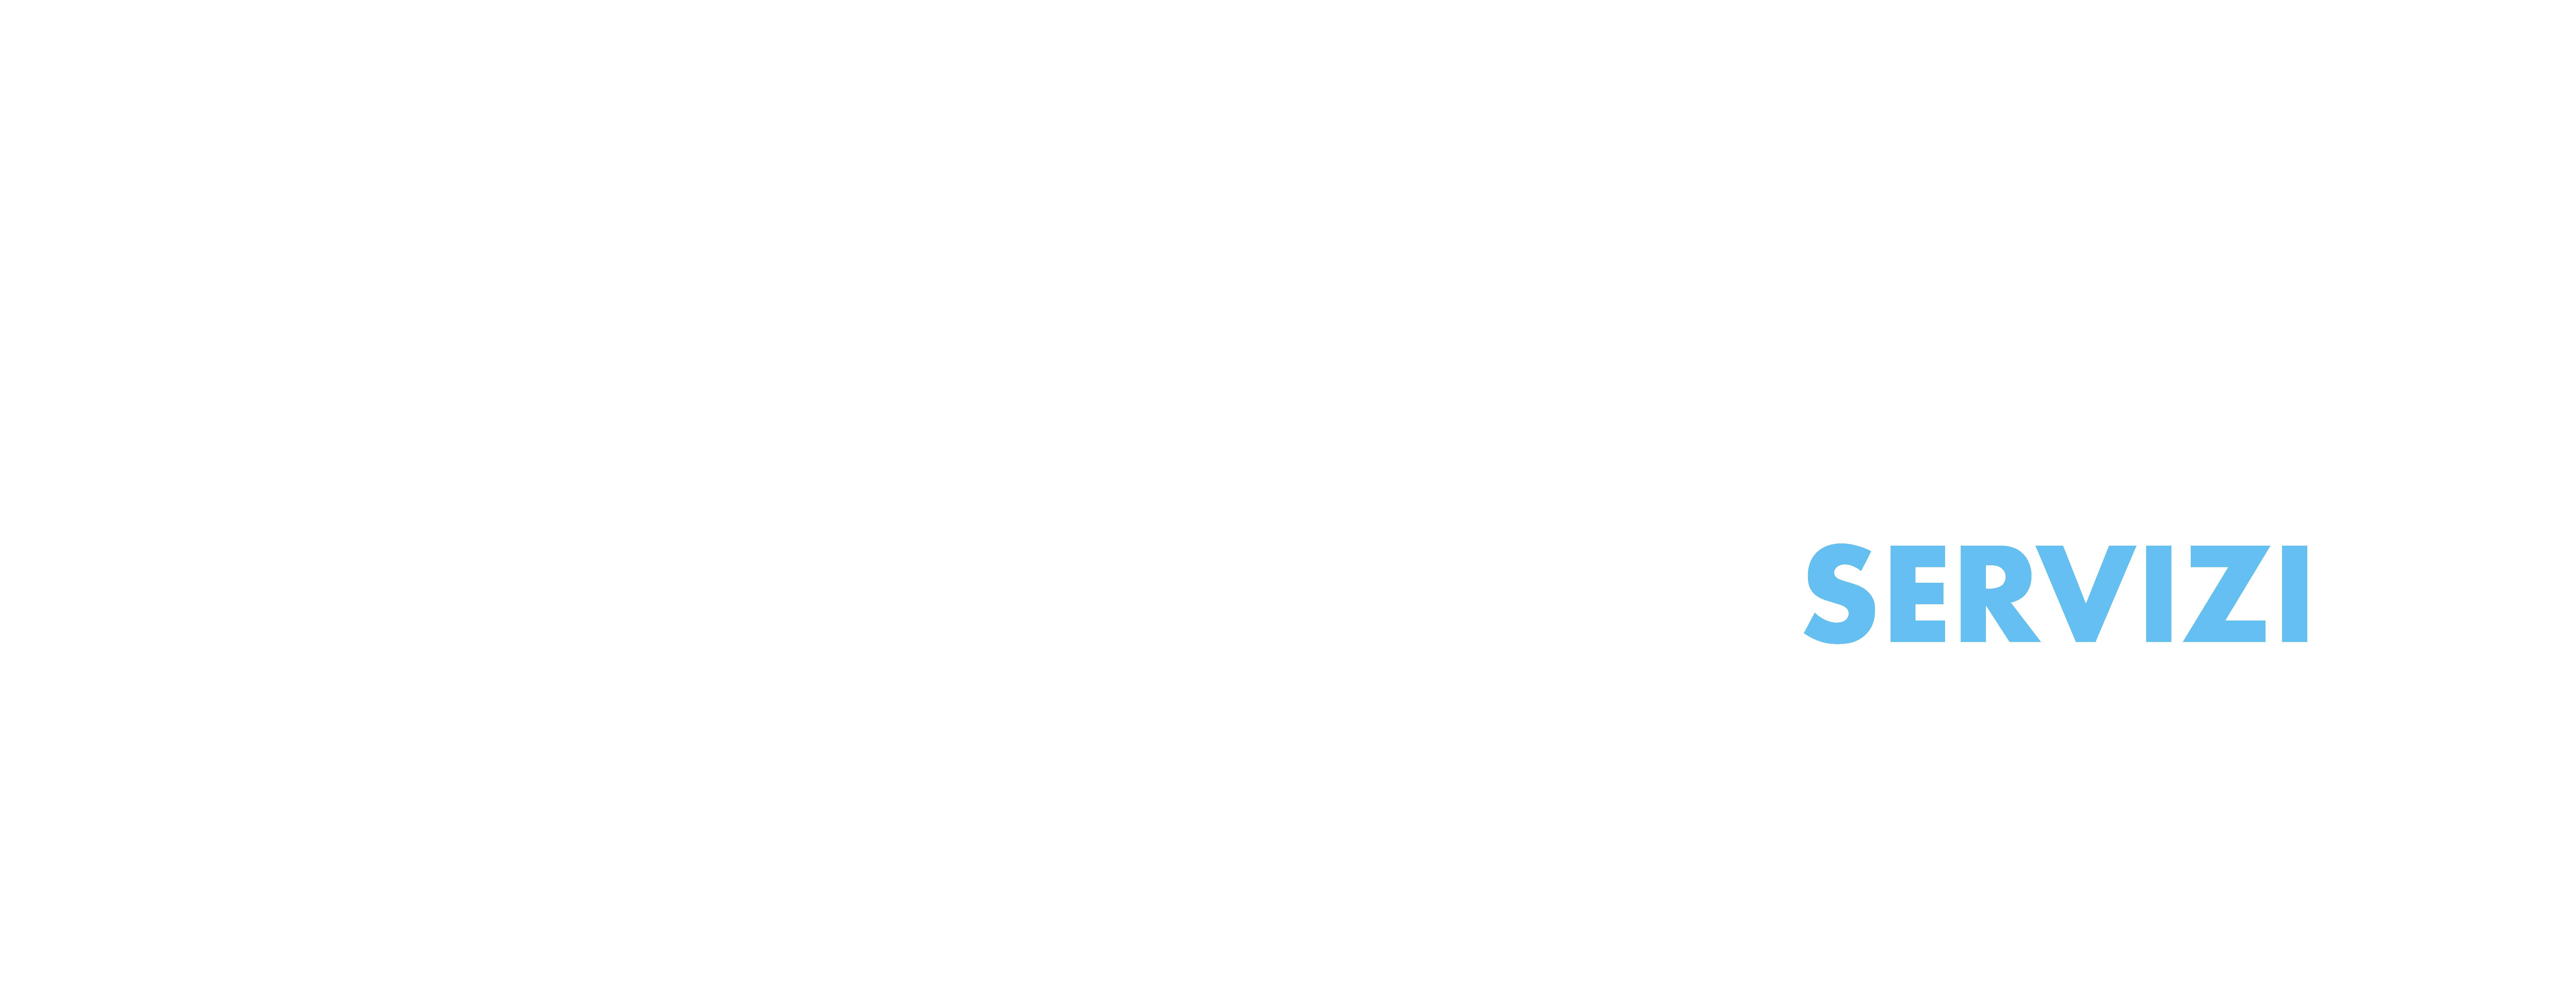 Assolobarda servizi logo